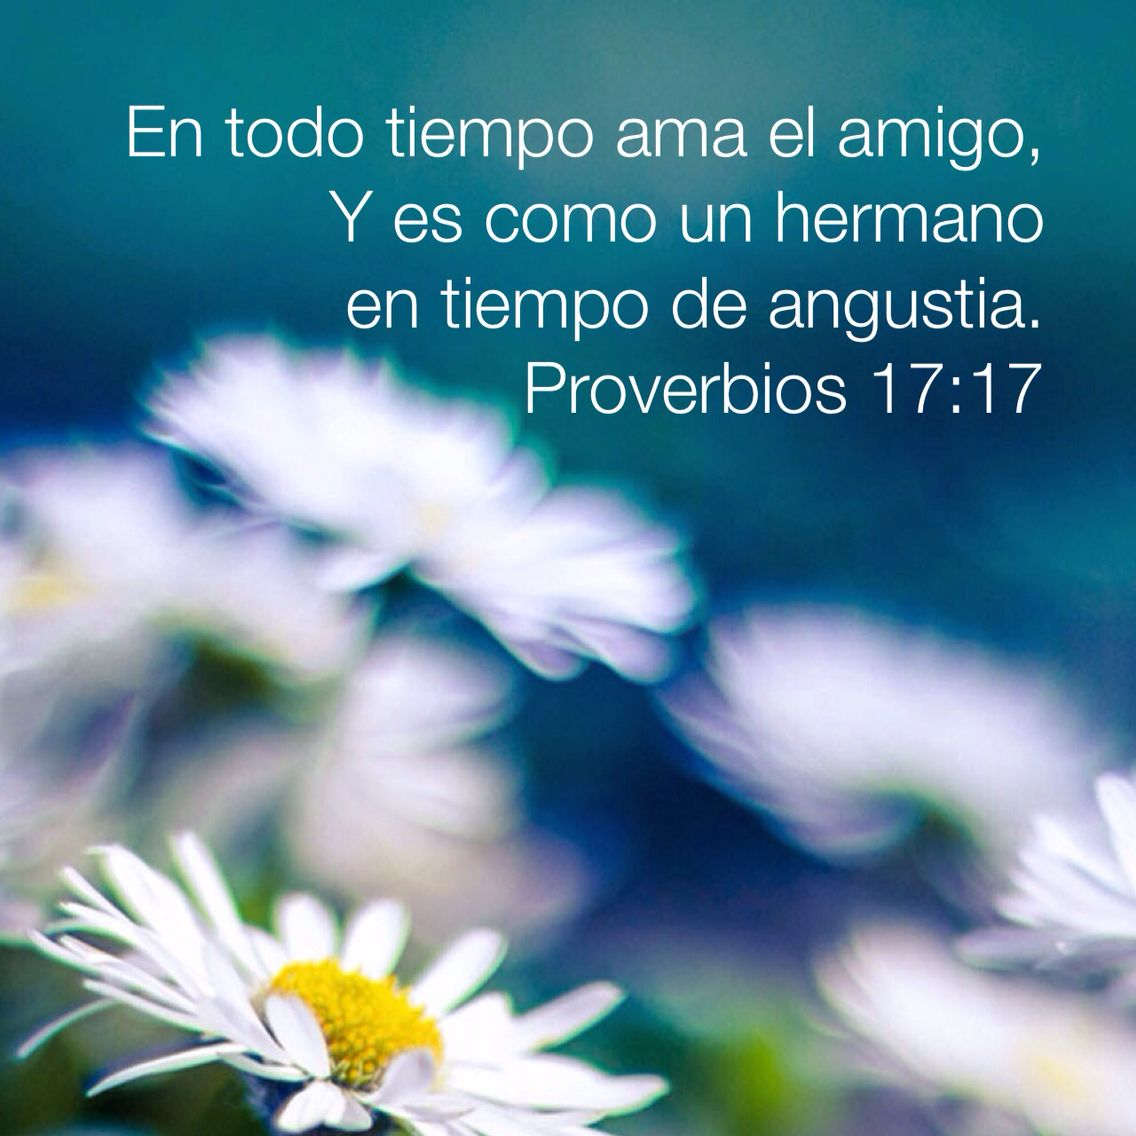 Proverbios amistad amor biblia   Mensajes bíblicos   Pinterest ...